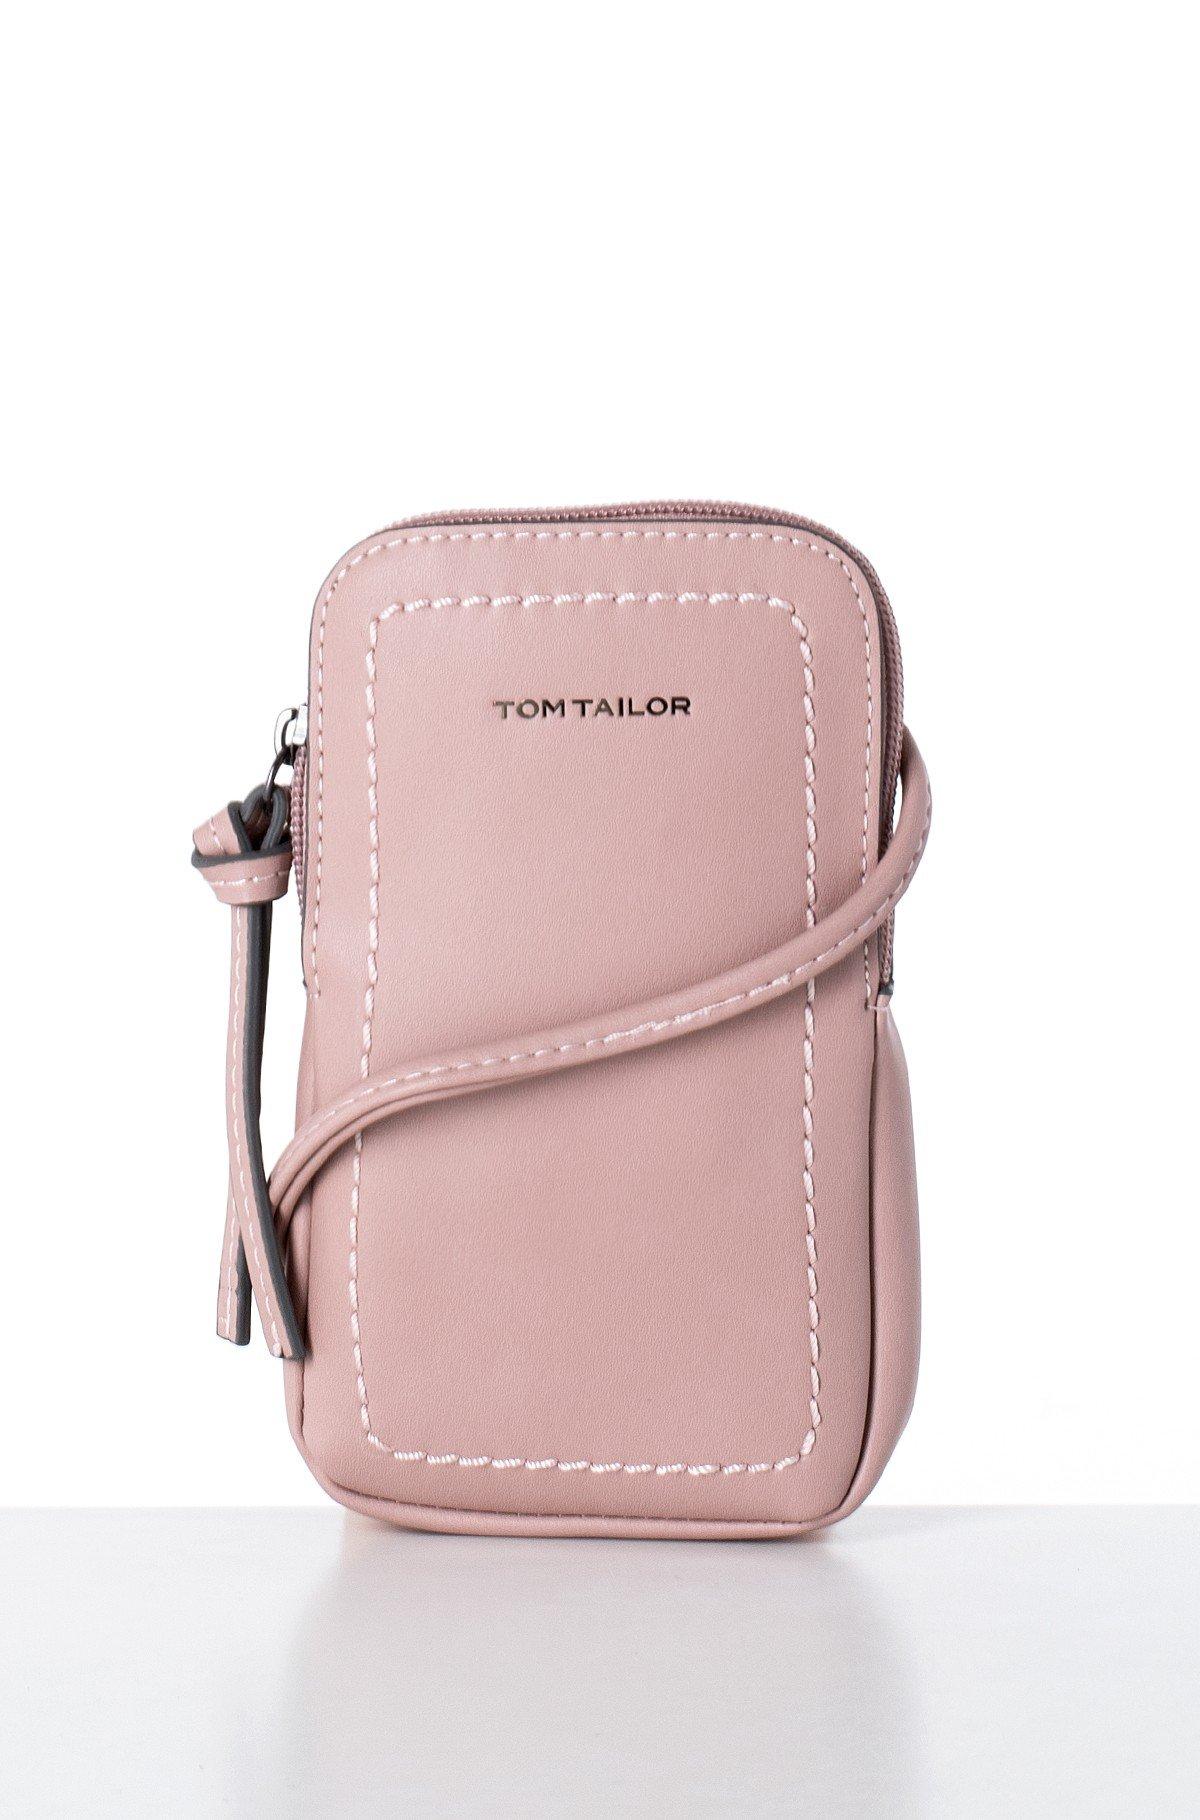 Mobile phone bag  28063-full-2